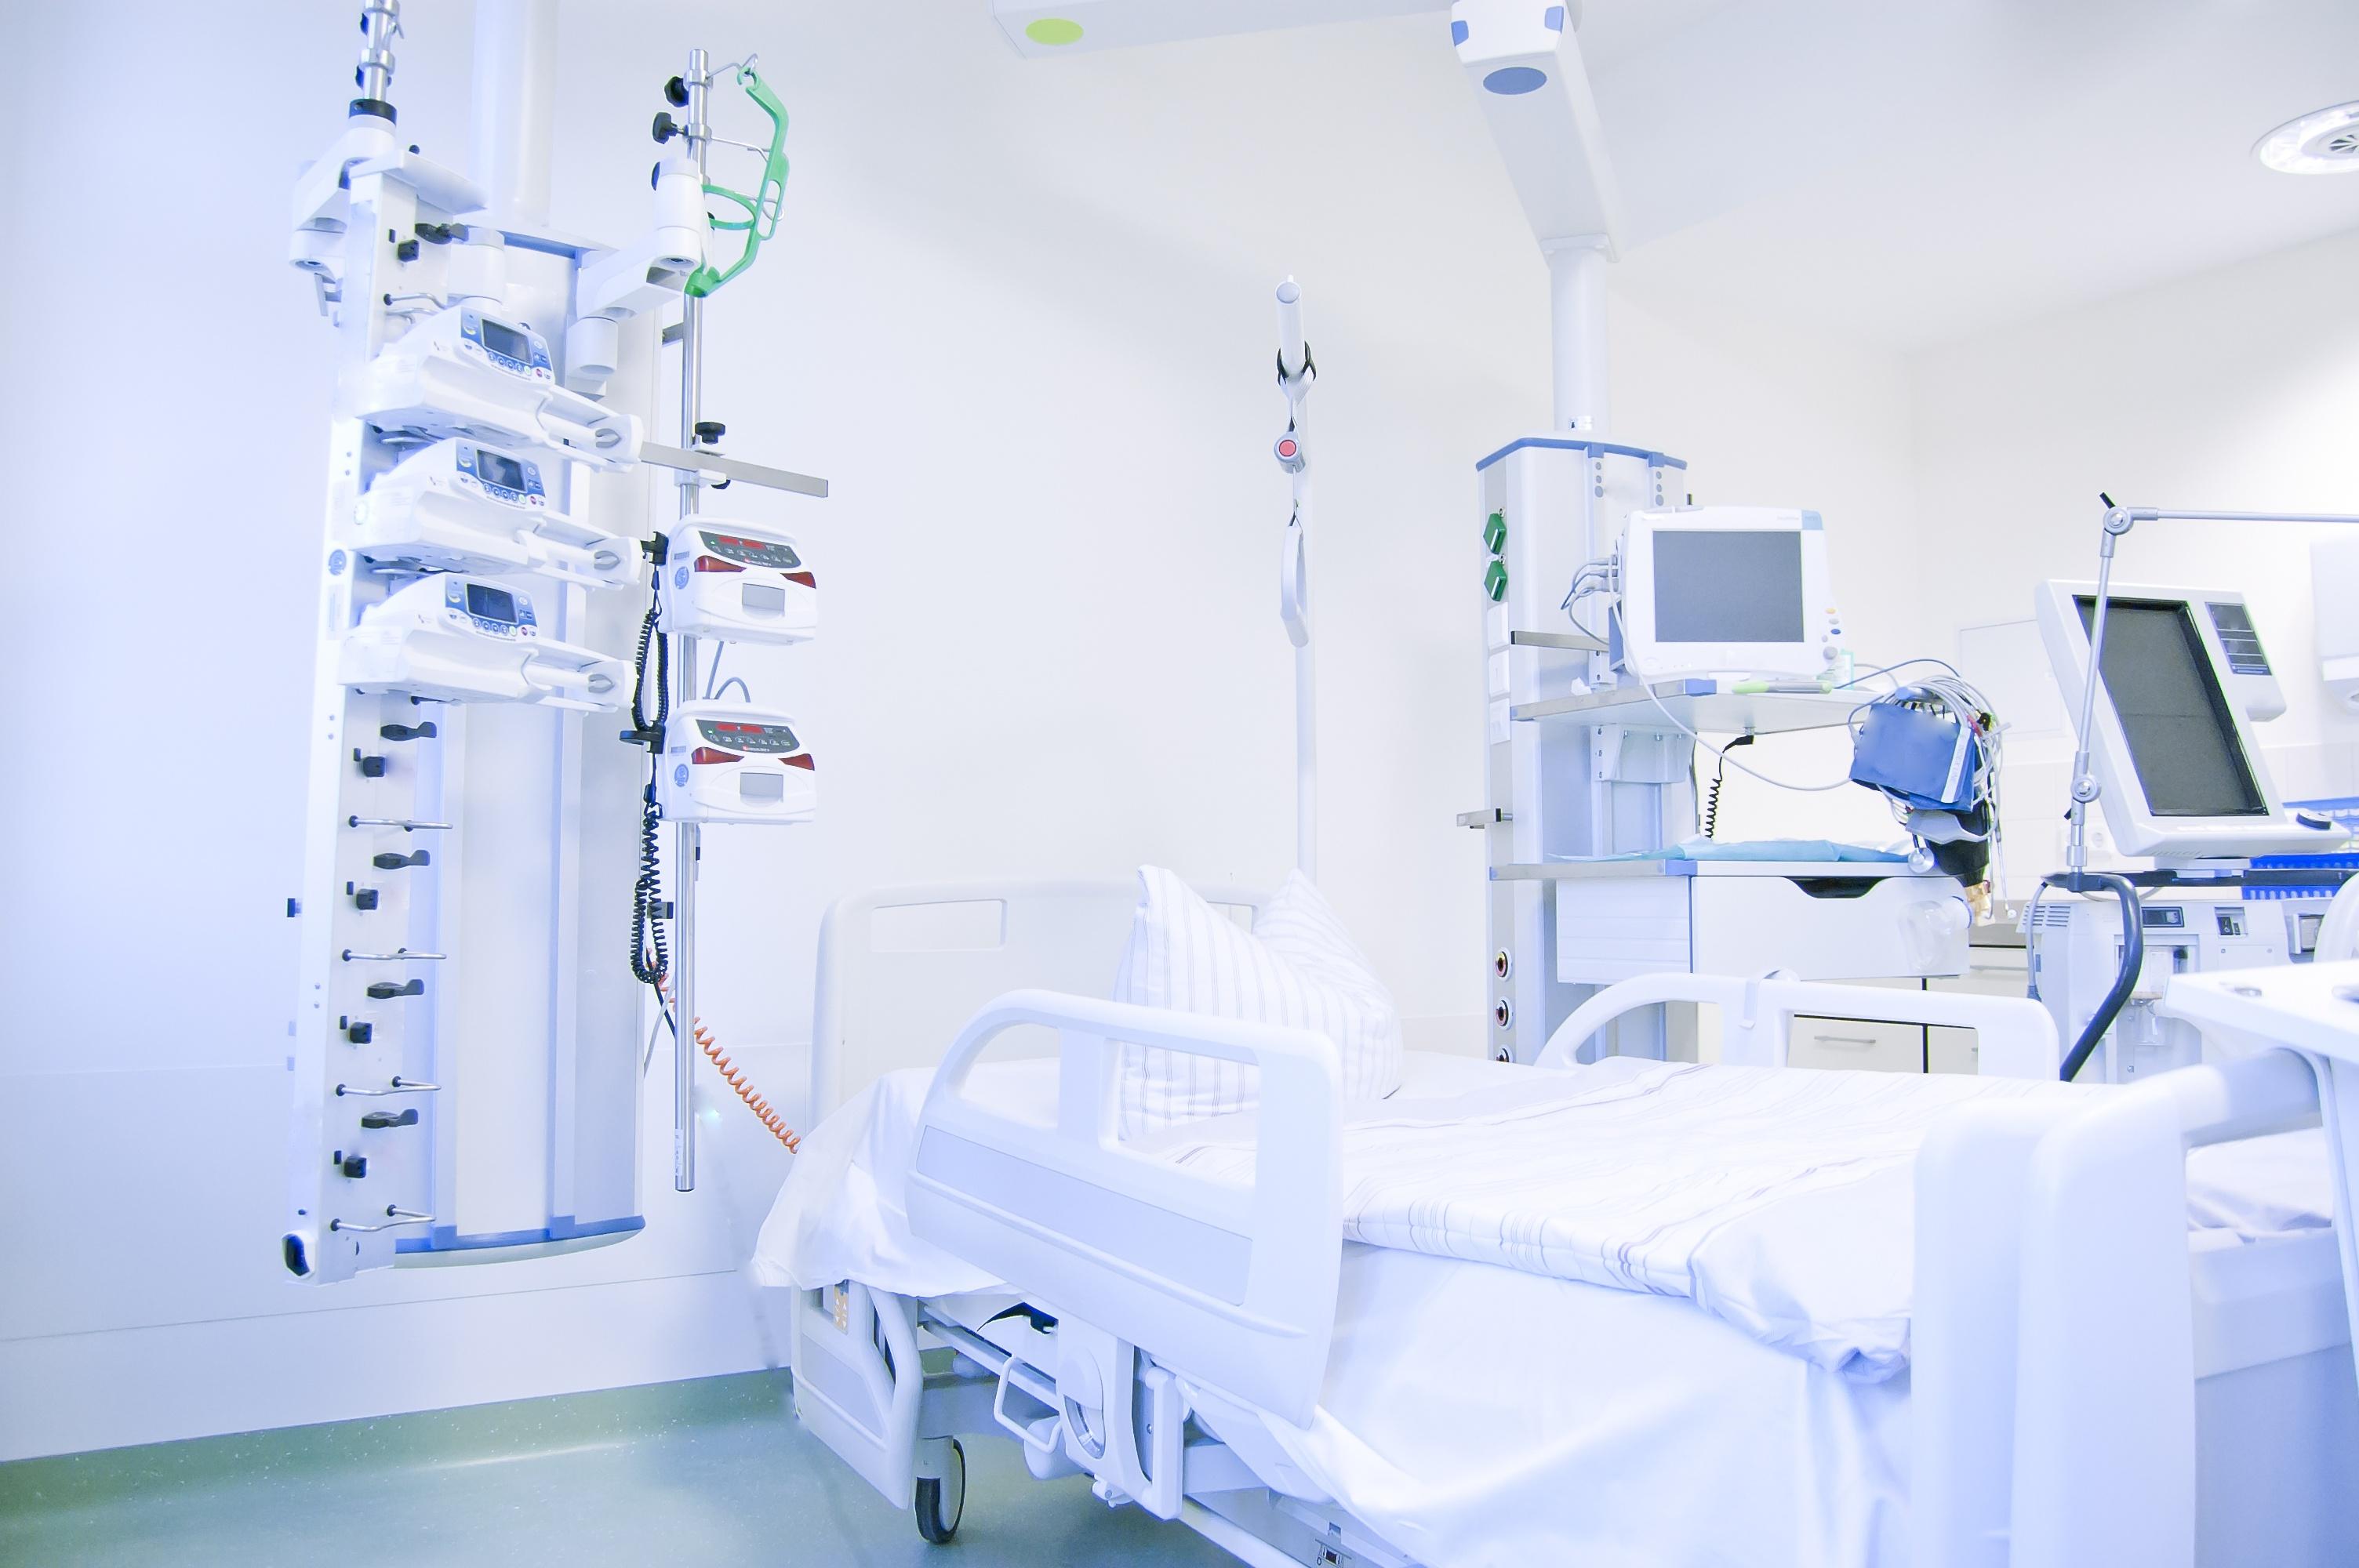 bigstock-Intensive-Care-Unit-With-Monit-38340688-1